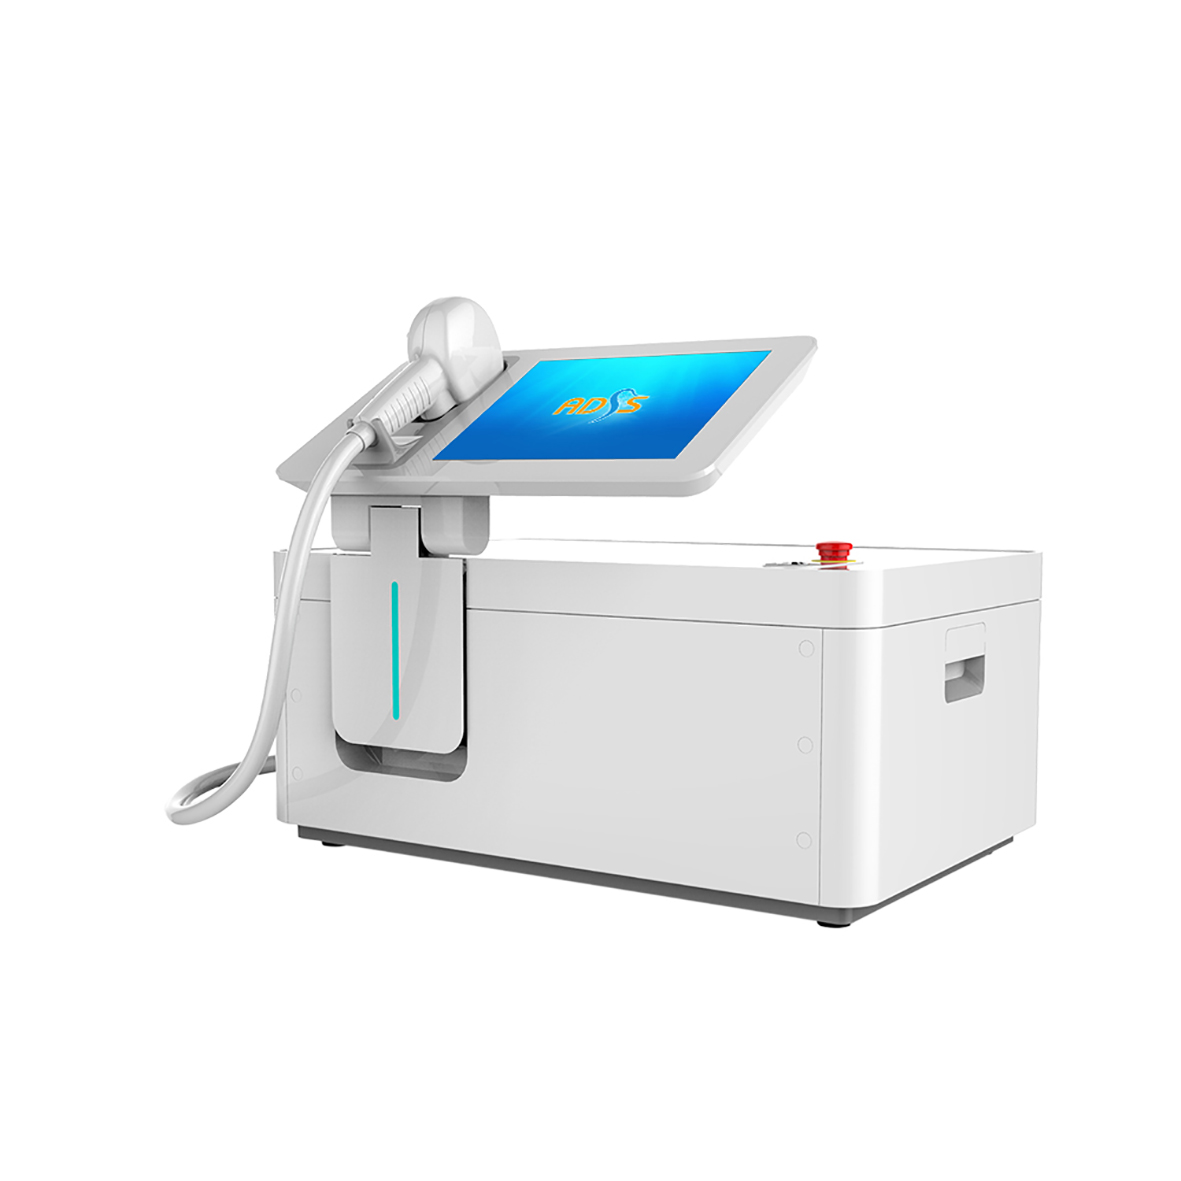 Portable Fiber Laser Hair Removal Machine Adss Laser